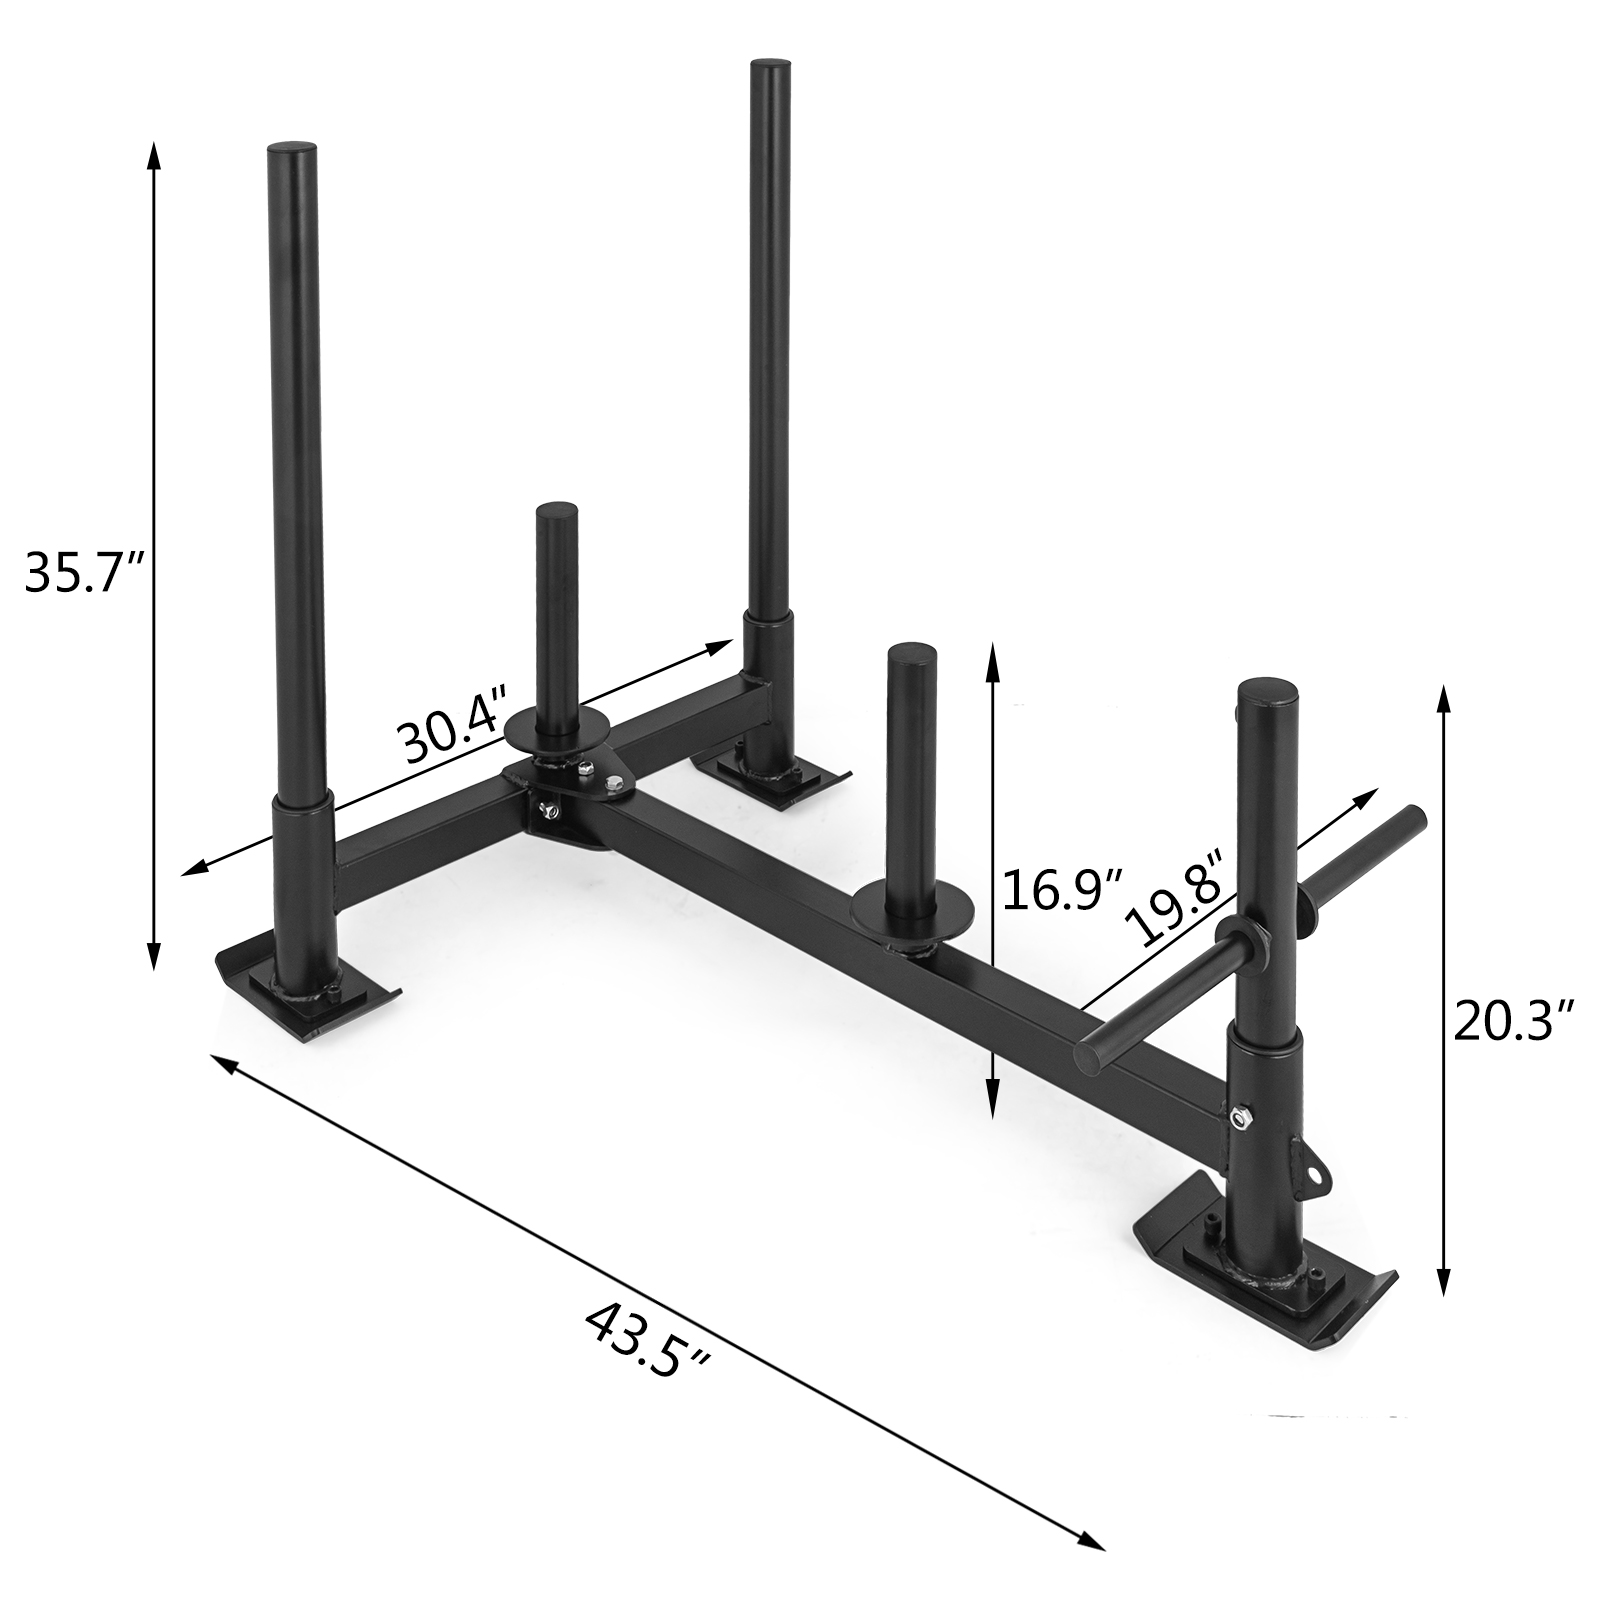 Fitness-HD-Weight-Sled-Low-Push-Pull-High-Training-Training-Fitness-Plates miniatura 2